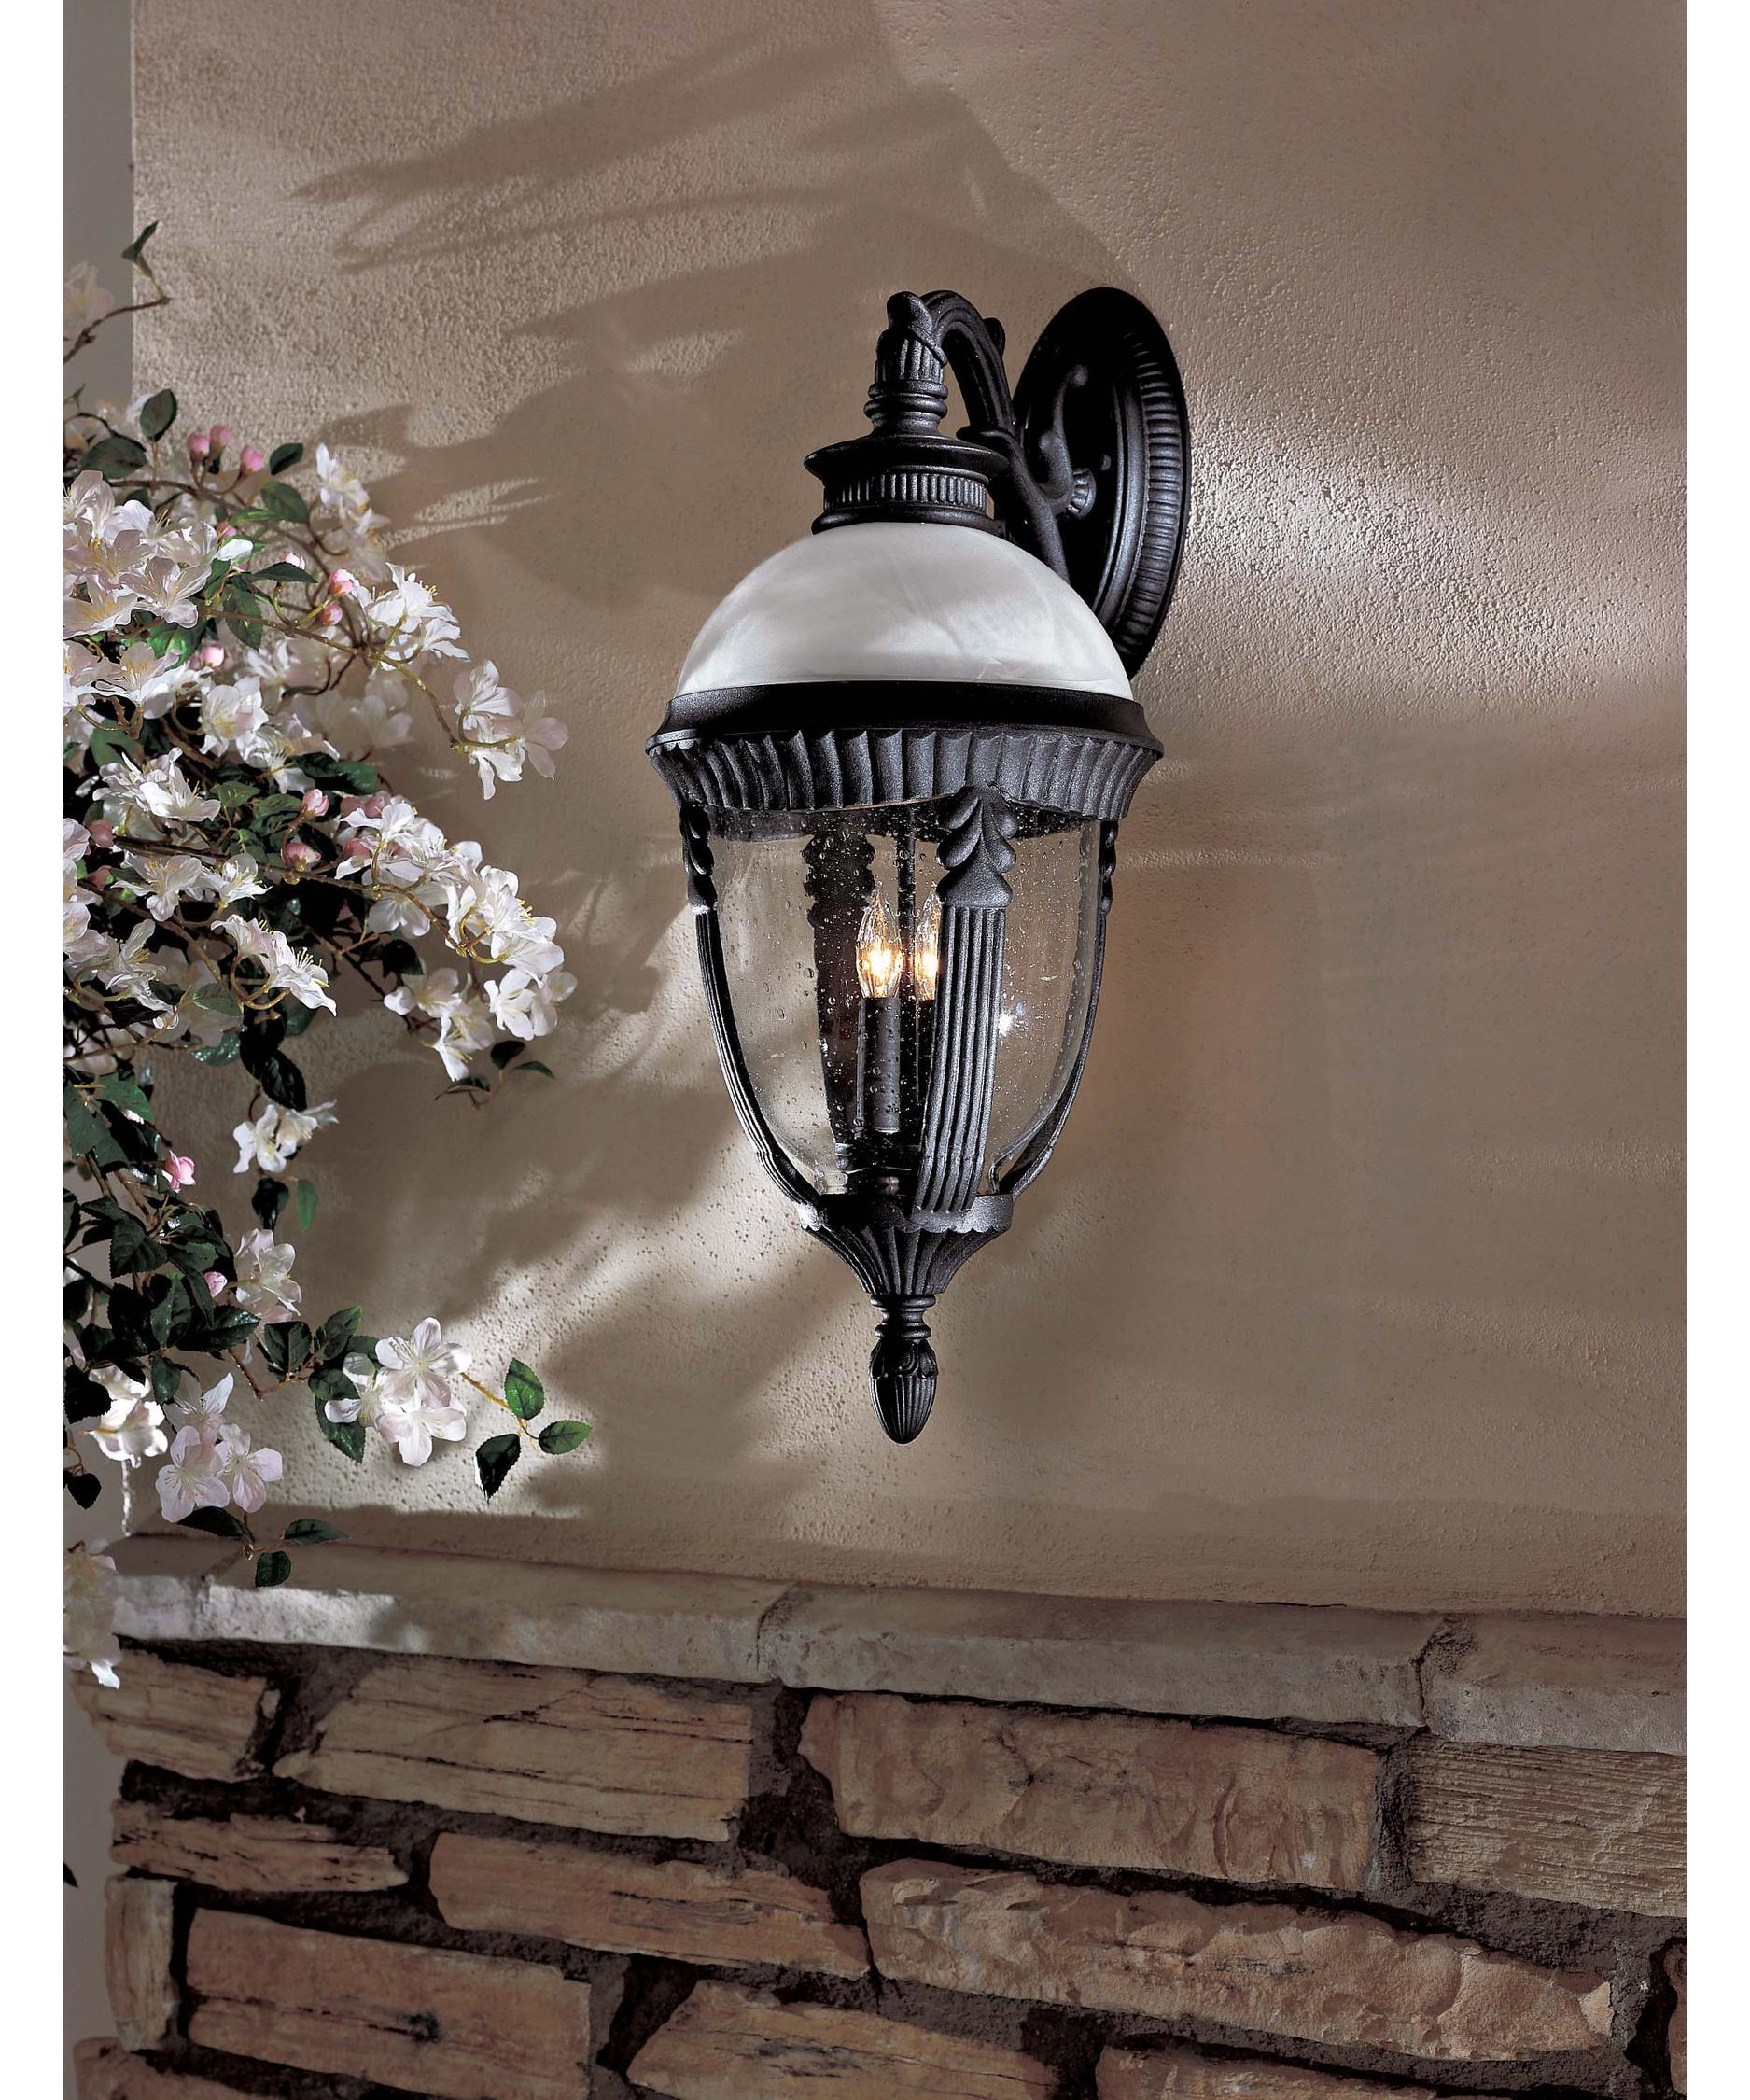 Minka Lavery 8975 Heron Bay 12 Inch Wide 4 Light Outdoor Wall Light |  Capitol Lighting 1 800lighting.com